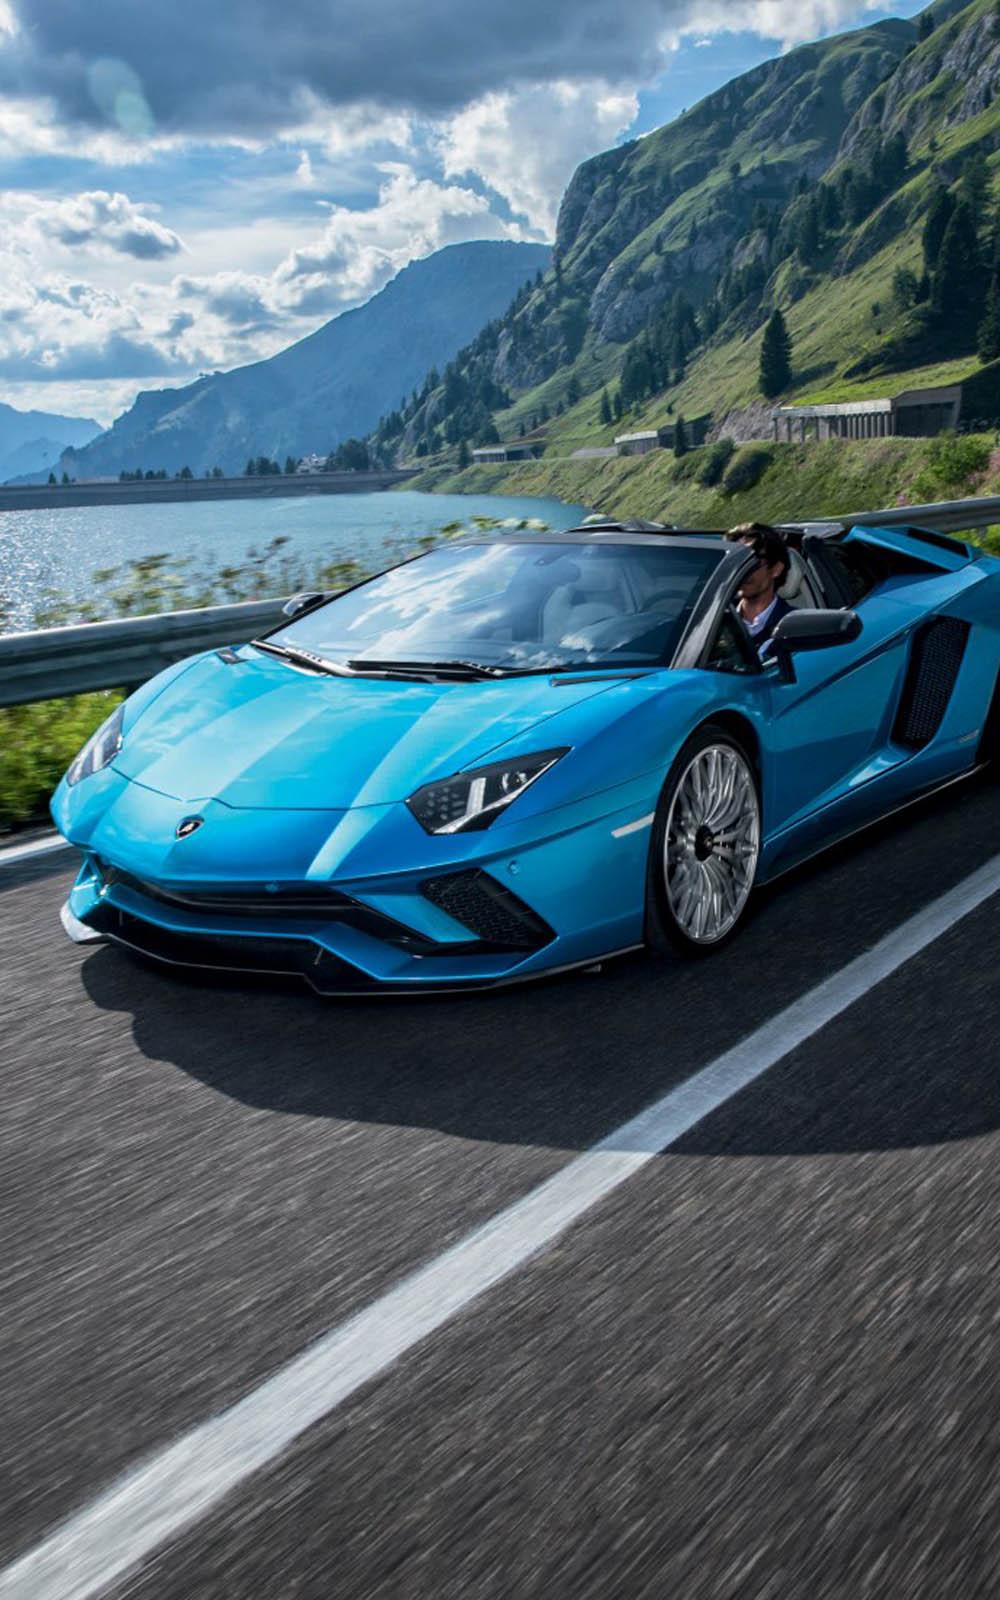 Download Blue Lamborghini Aventador S Roadster Free Pure 4K Ultra HD Mobile Wallpaper